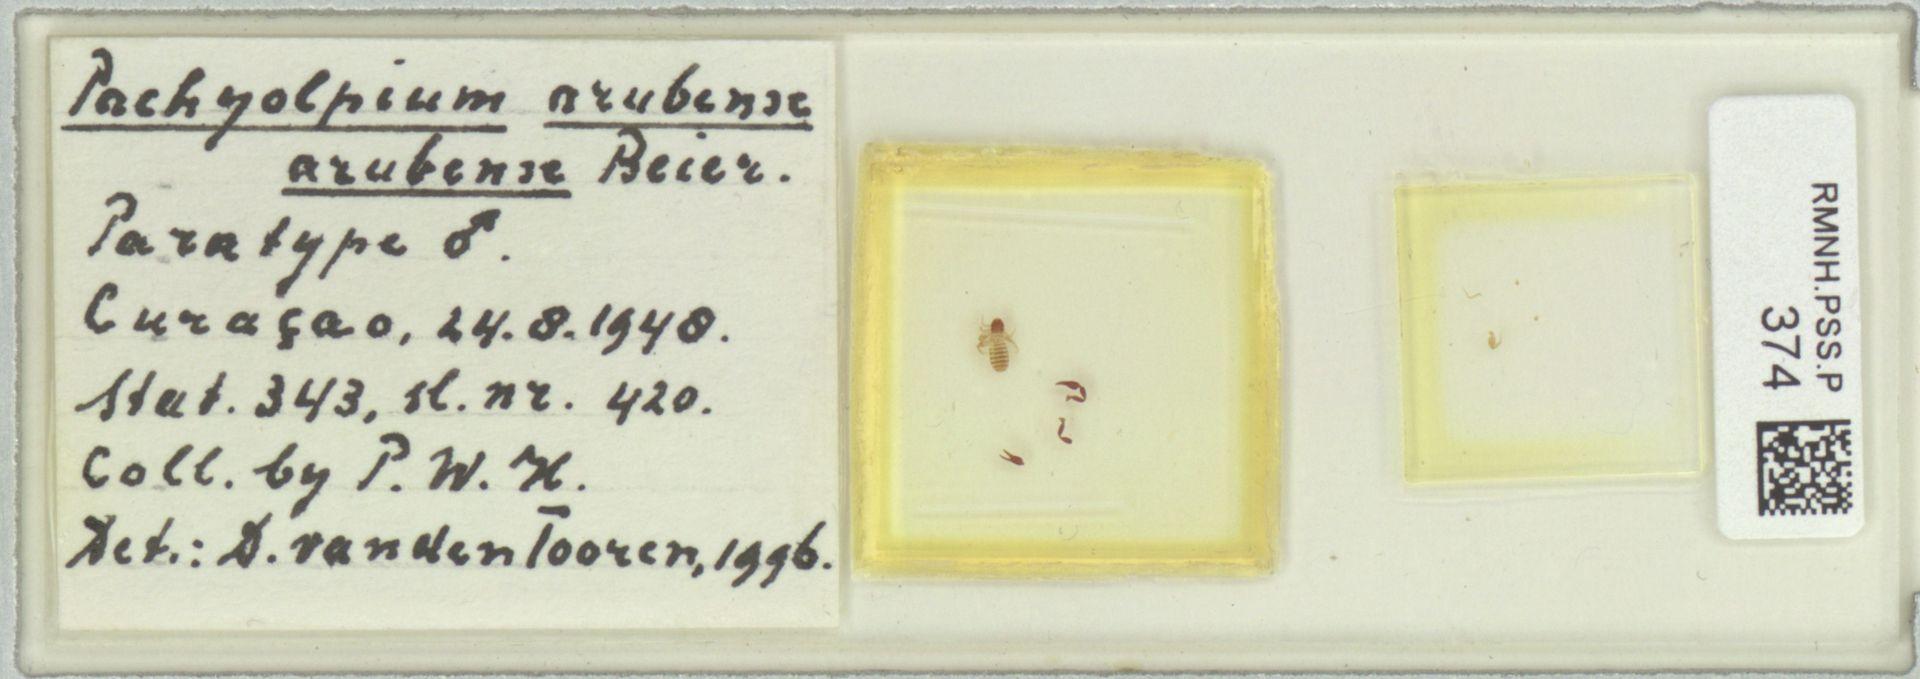 RMNH.PSS.P.374 | Pachyolpium arubense arubense